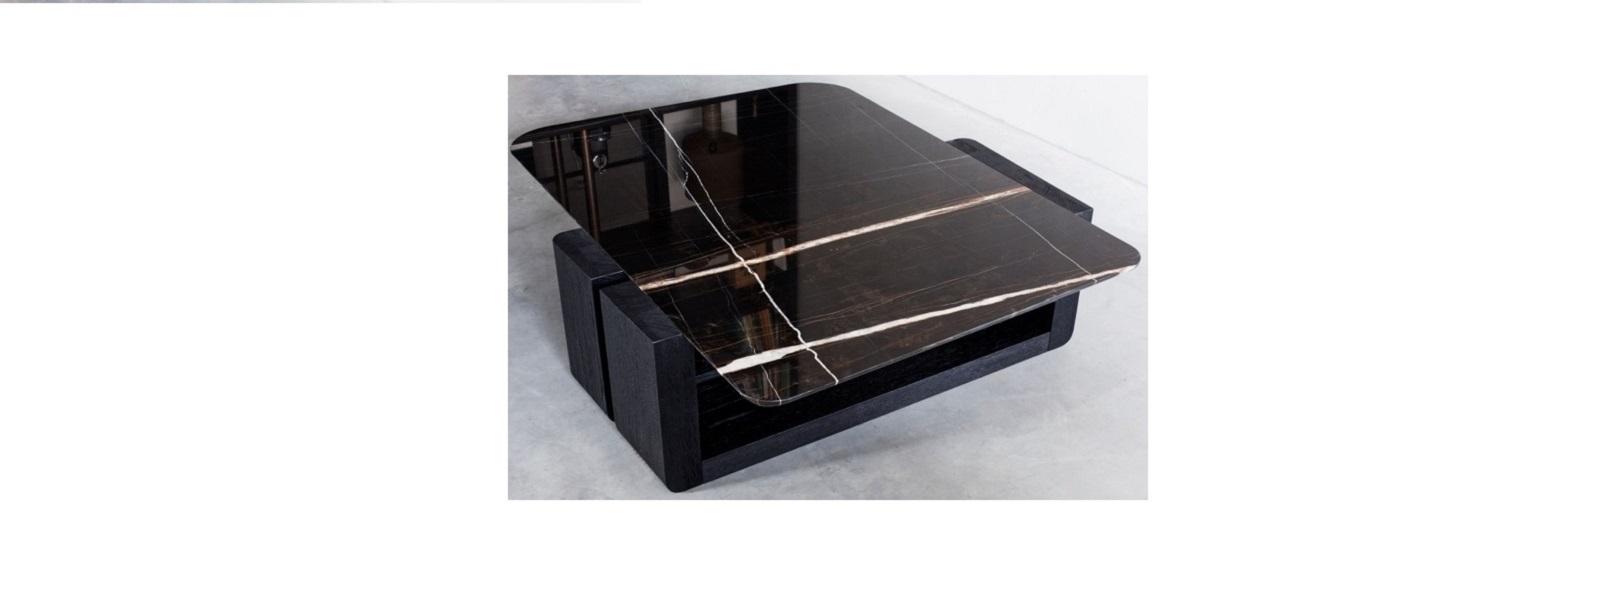 Kitale cocktail table (8) klein.jpg